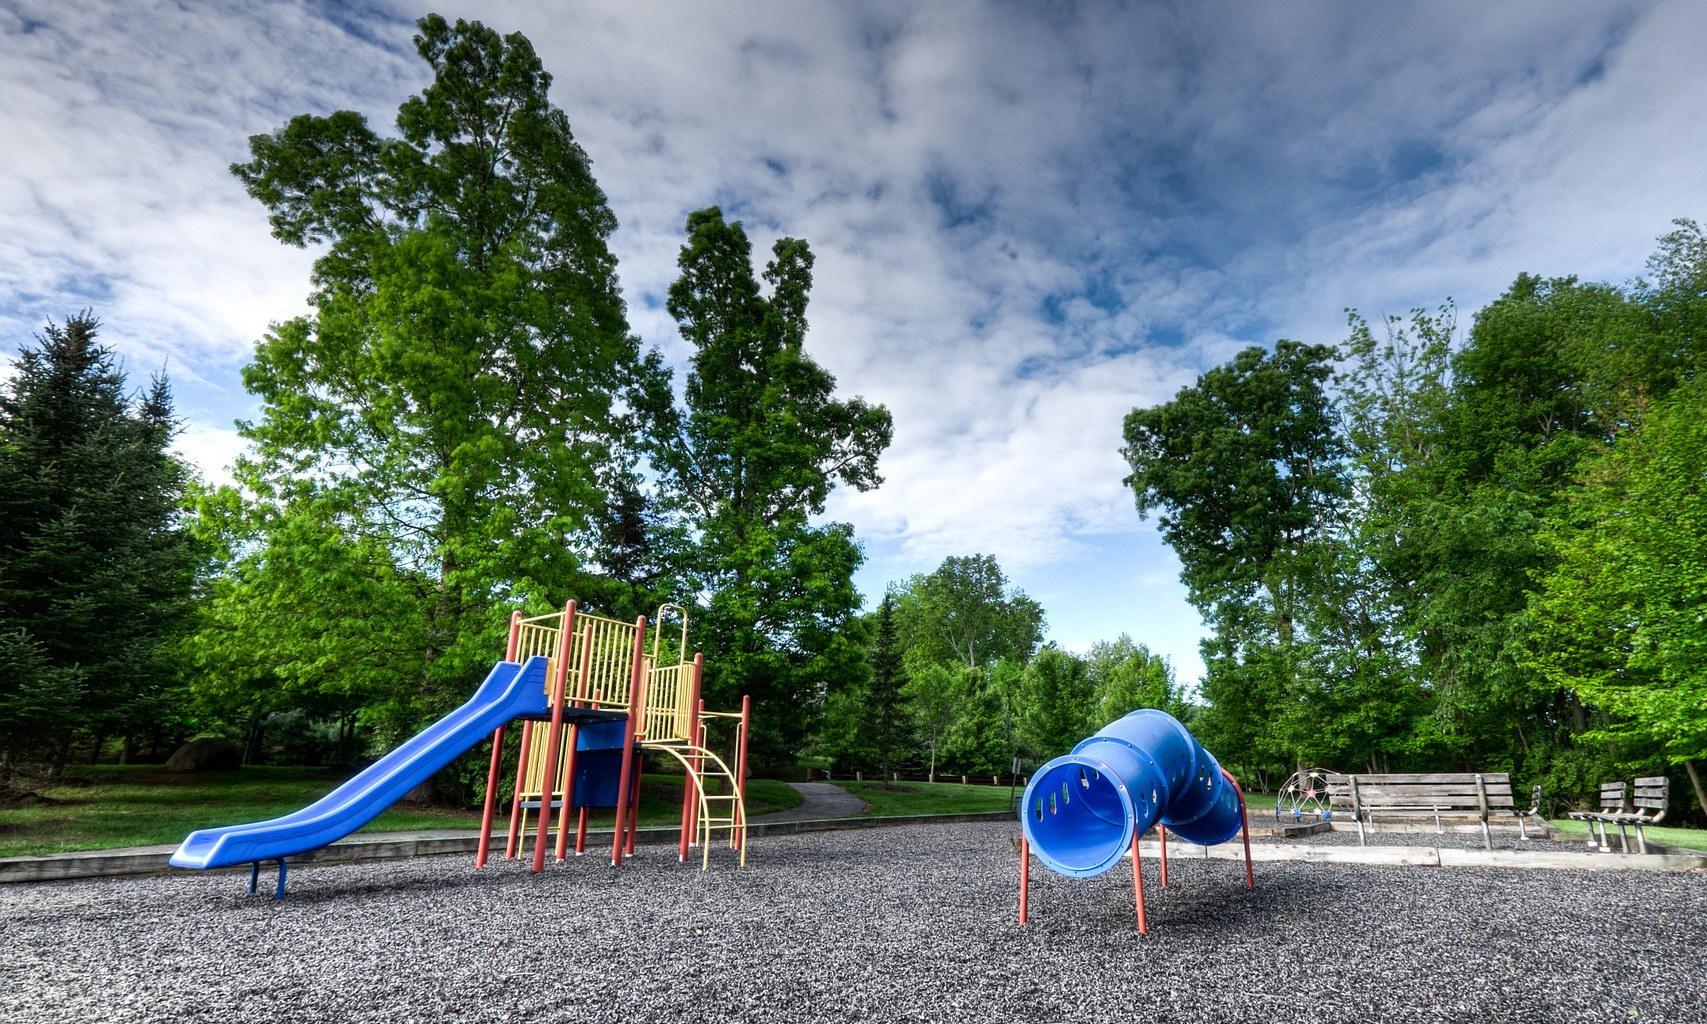 Pestizide: So versucht sind Kinderspielplätze